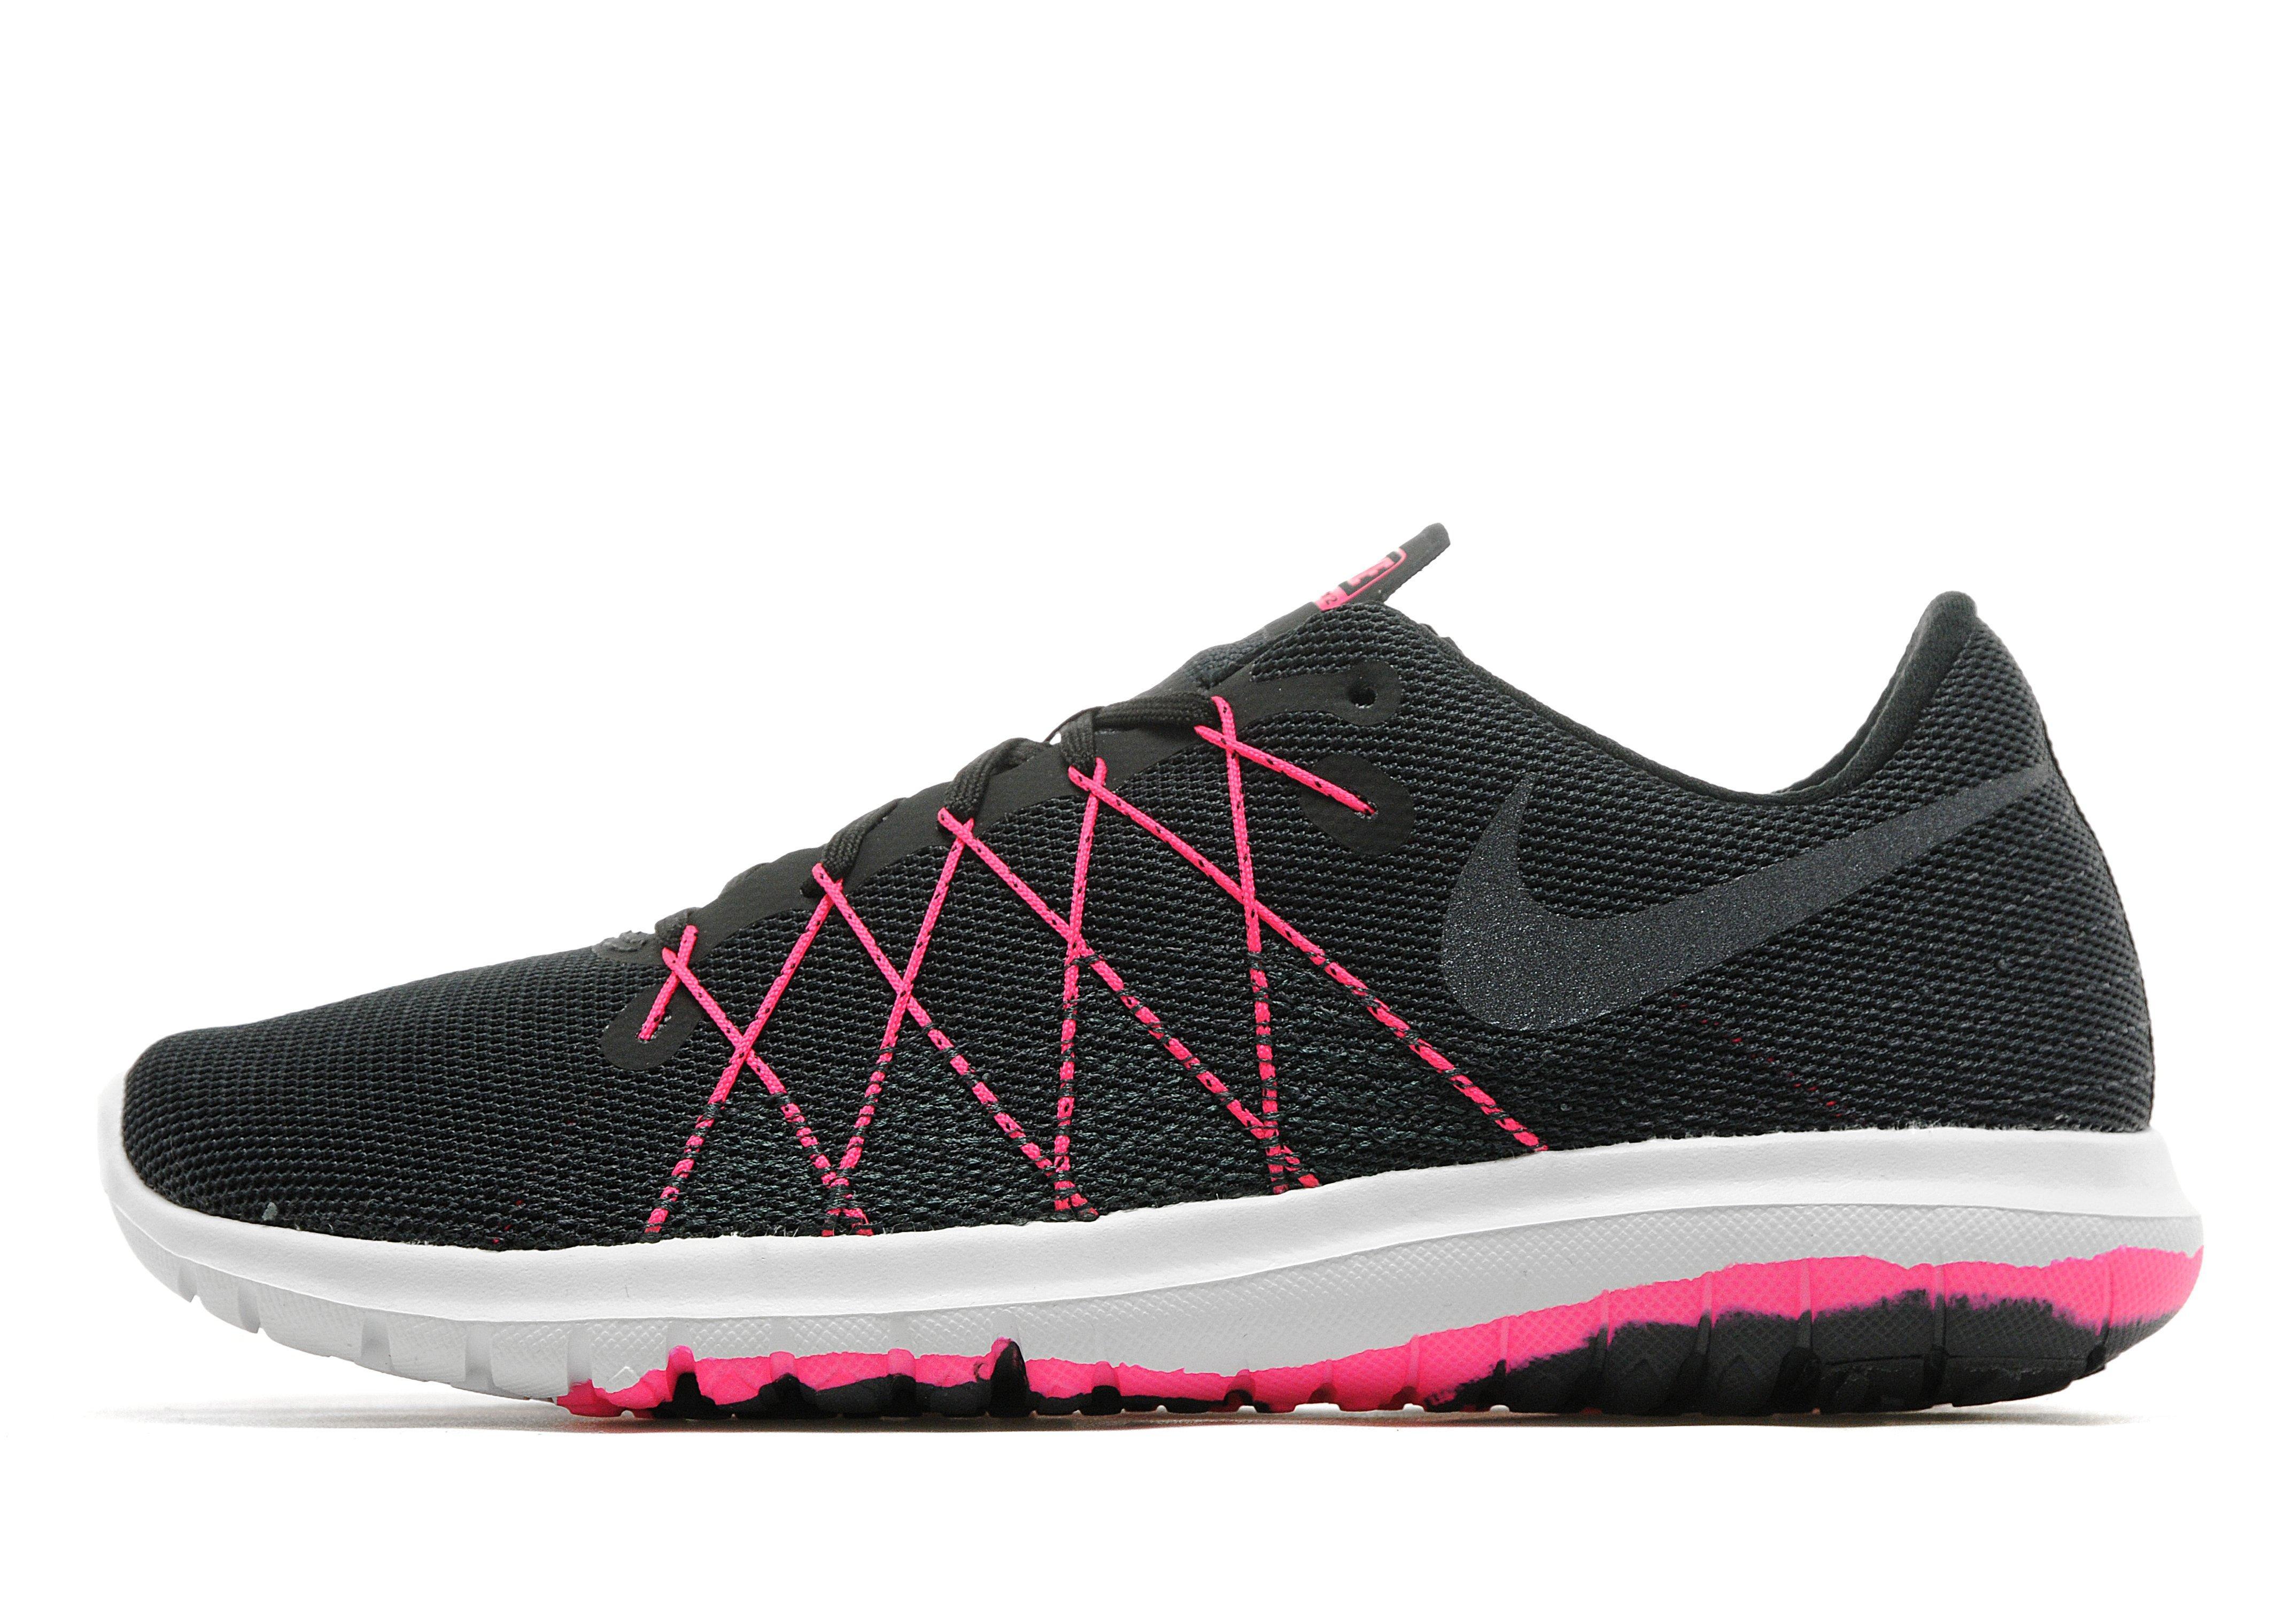 Nike Free Run 4.0 V2 Womens Review